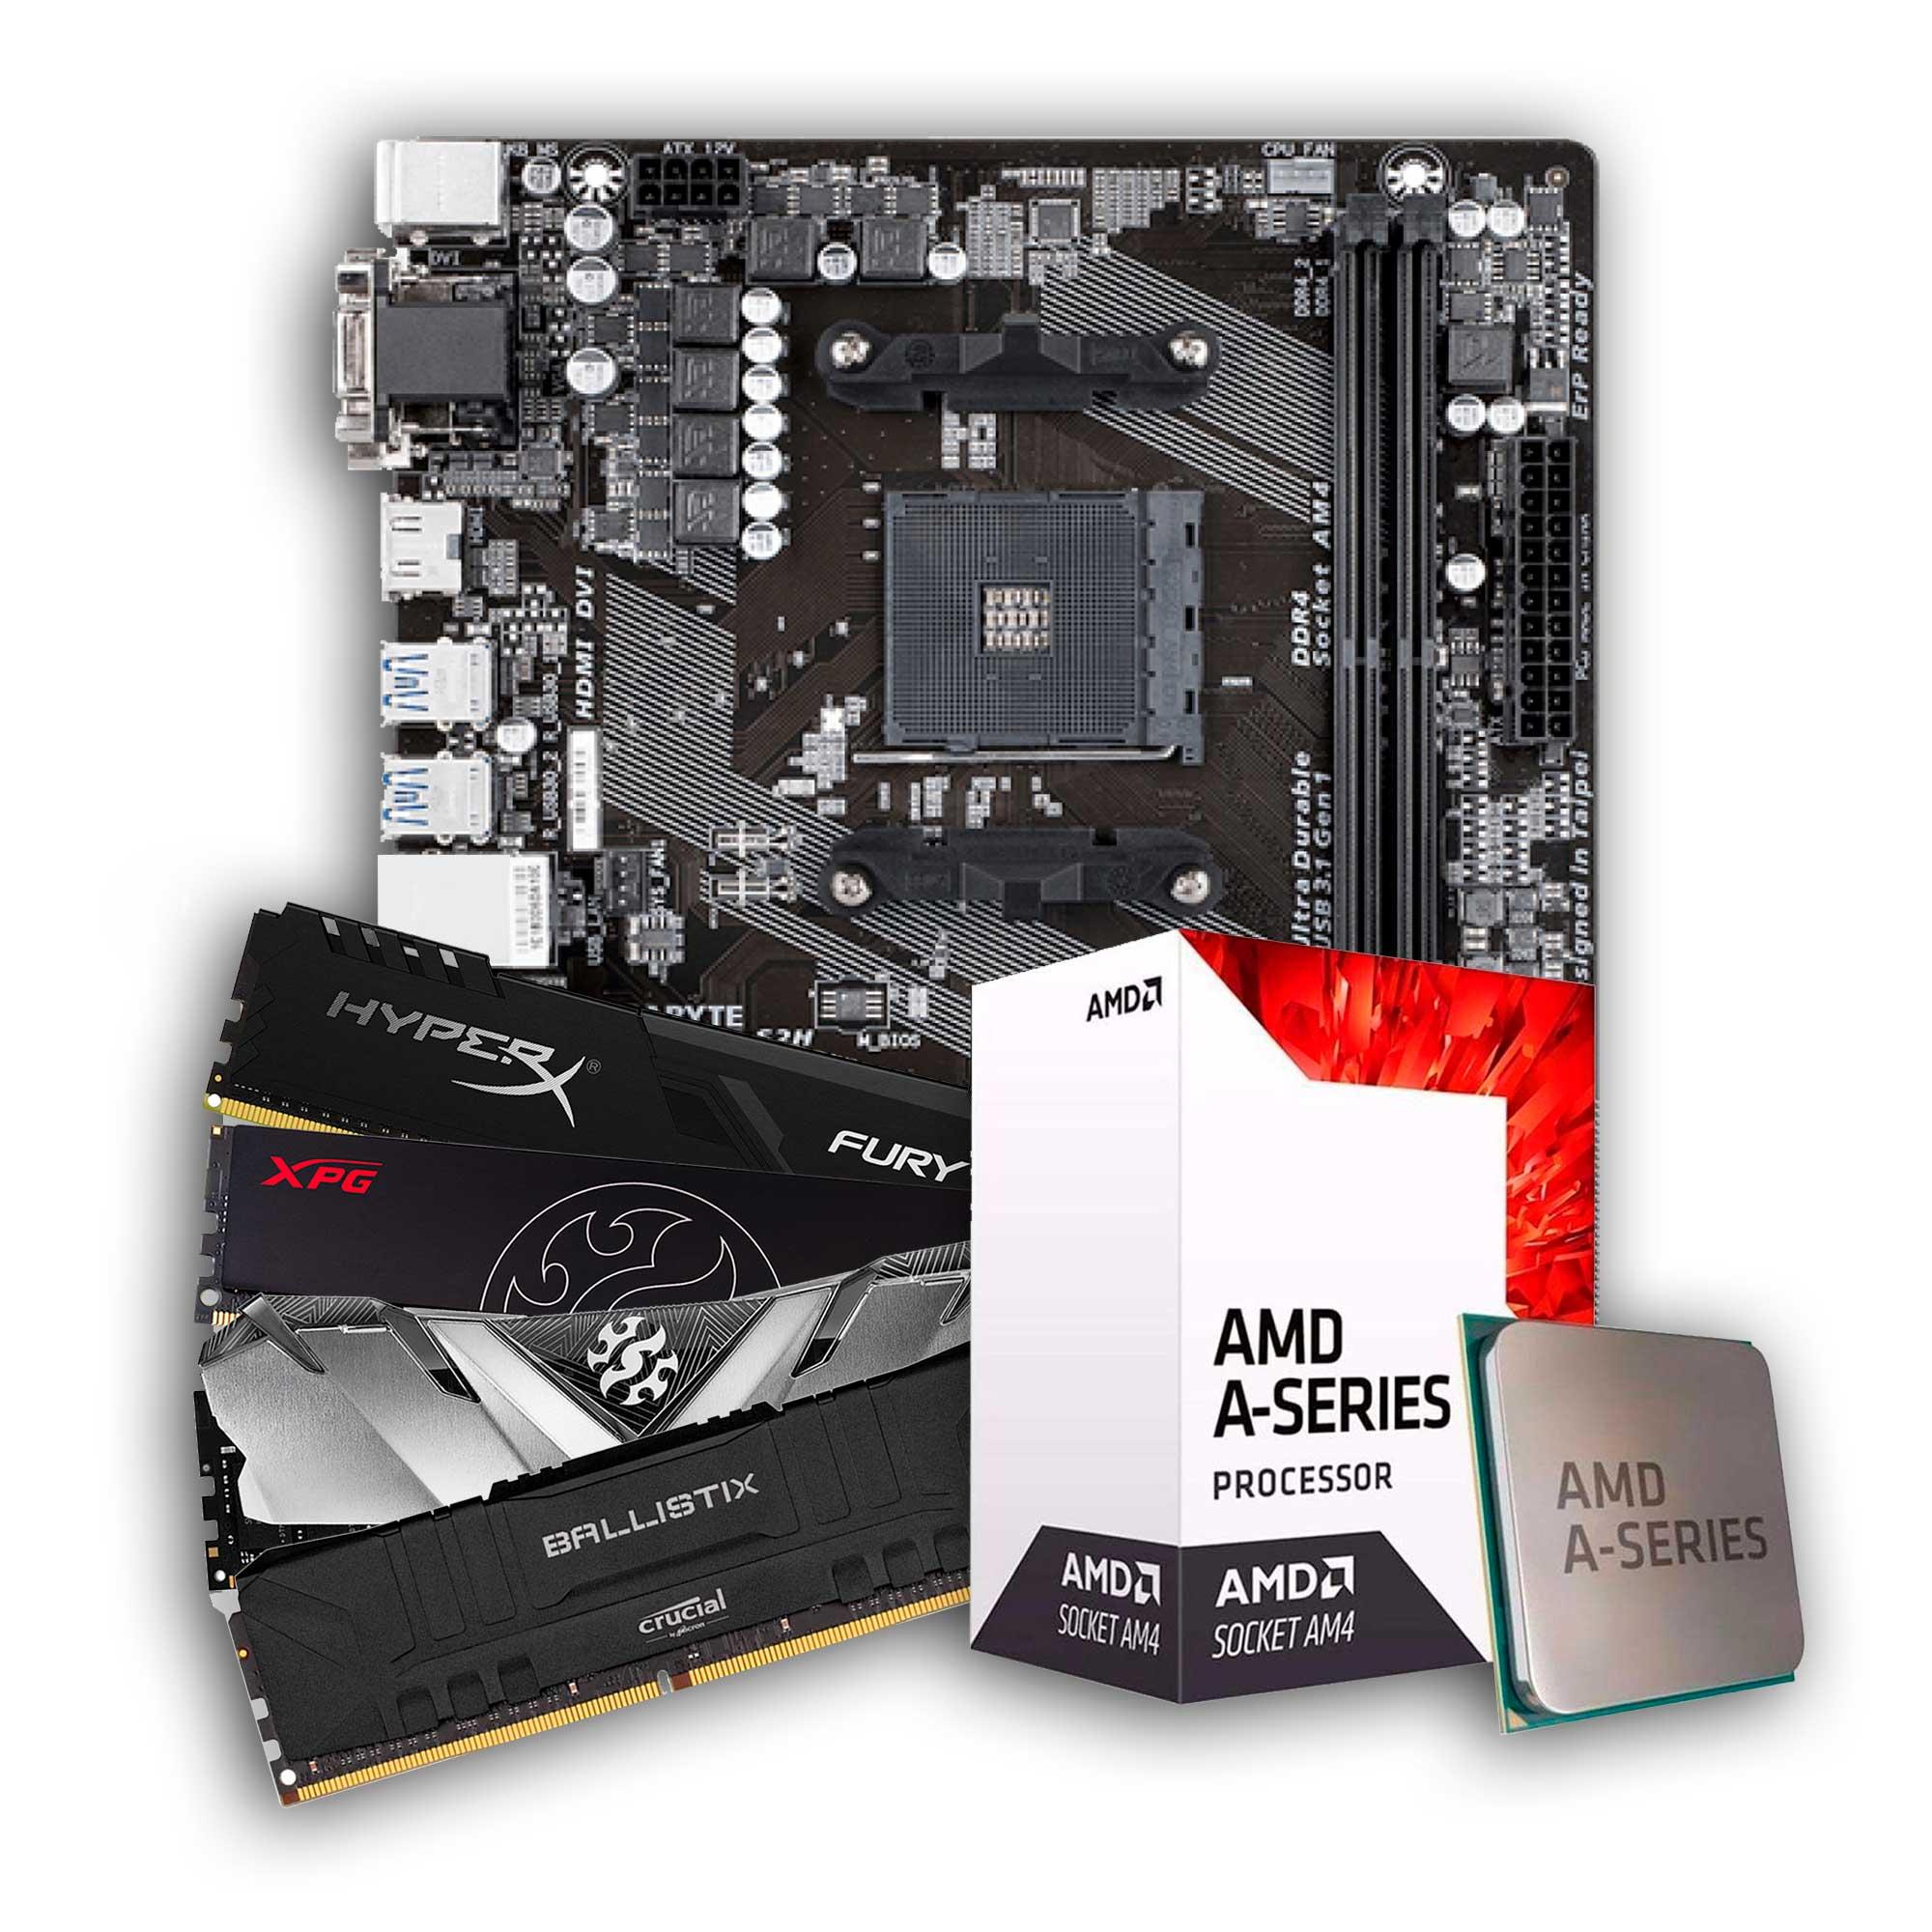 Kit Upgrade, AMD A6 9500, Placa Mãe A320M, Memória DDR4 8GB 2666MHz